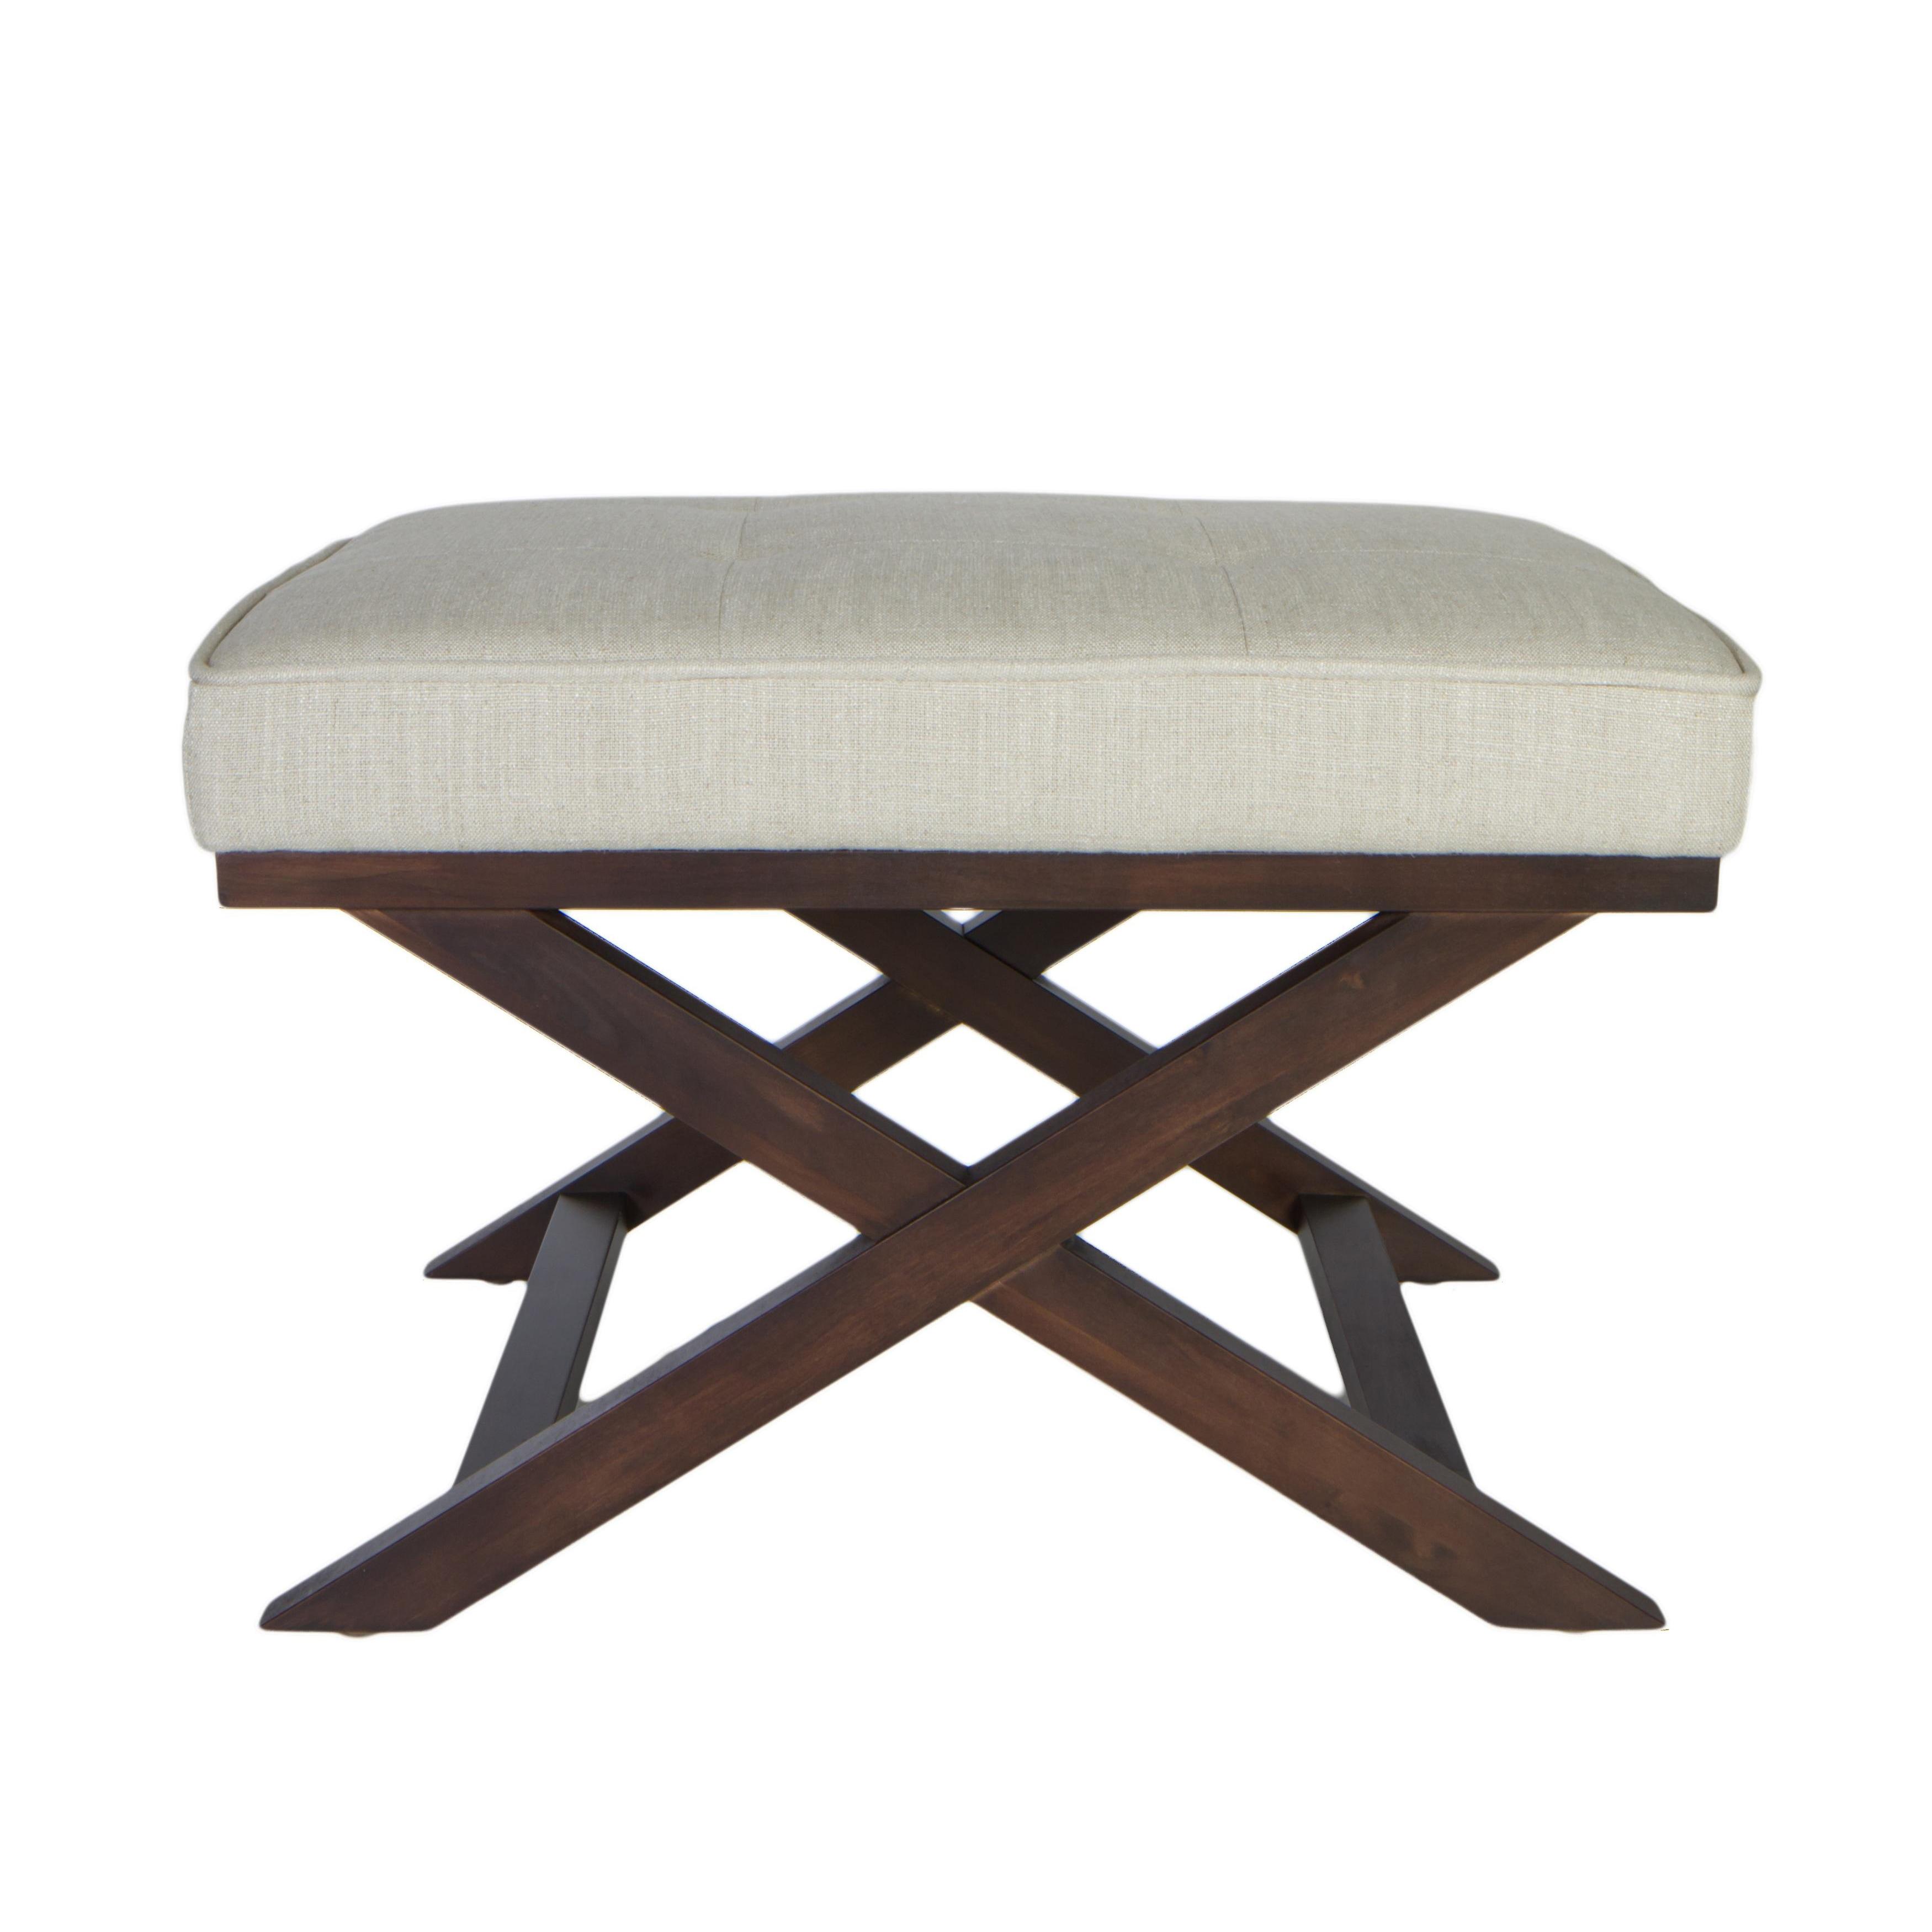 Cortesi Home Traditional Cross Legs Ari Beige Linen X Bench Ottoman